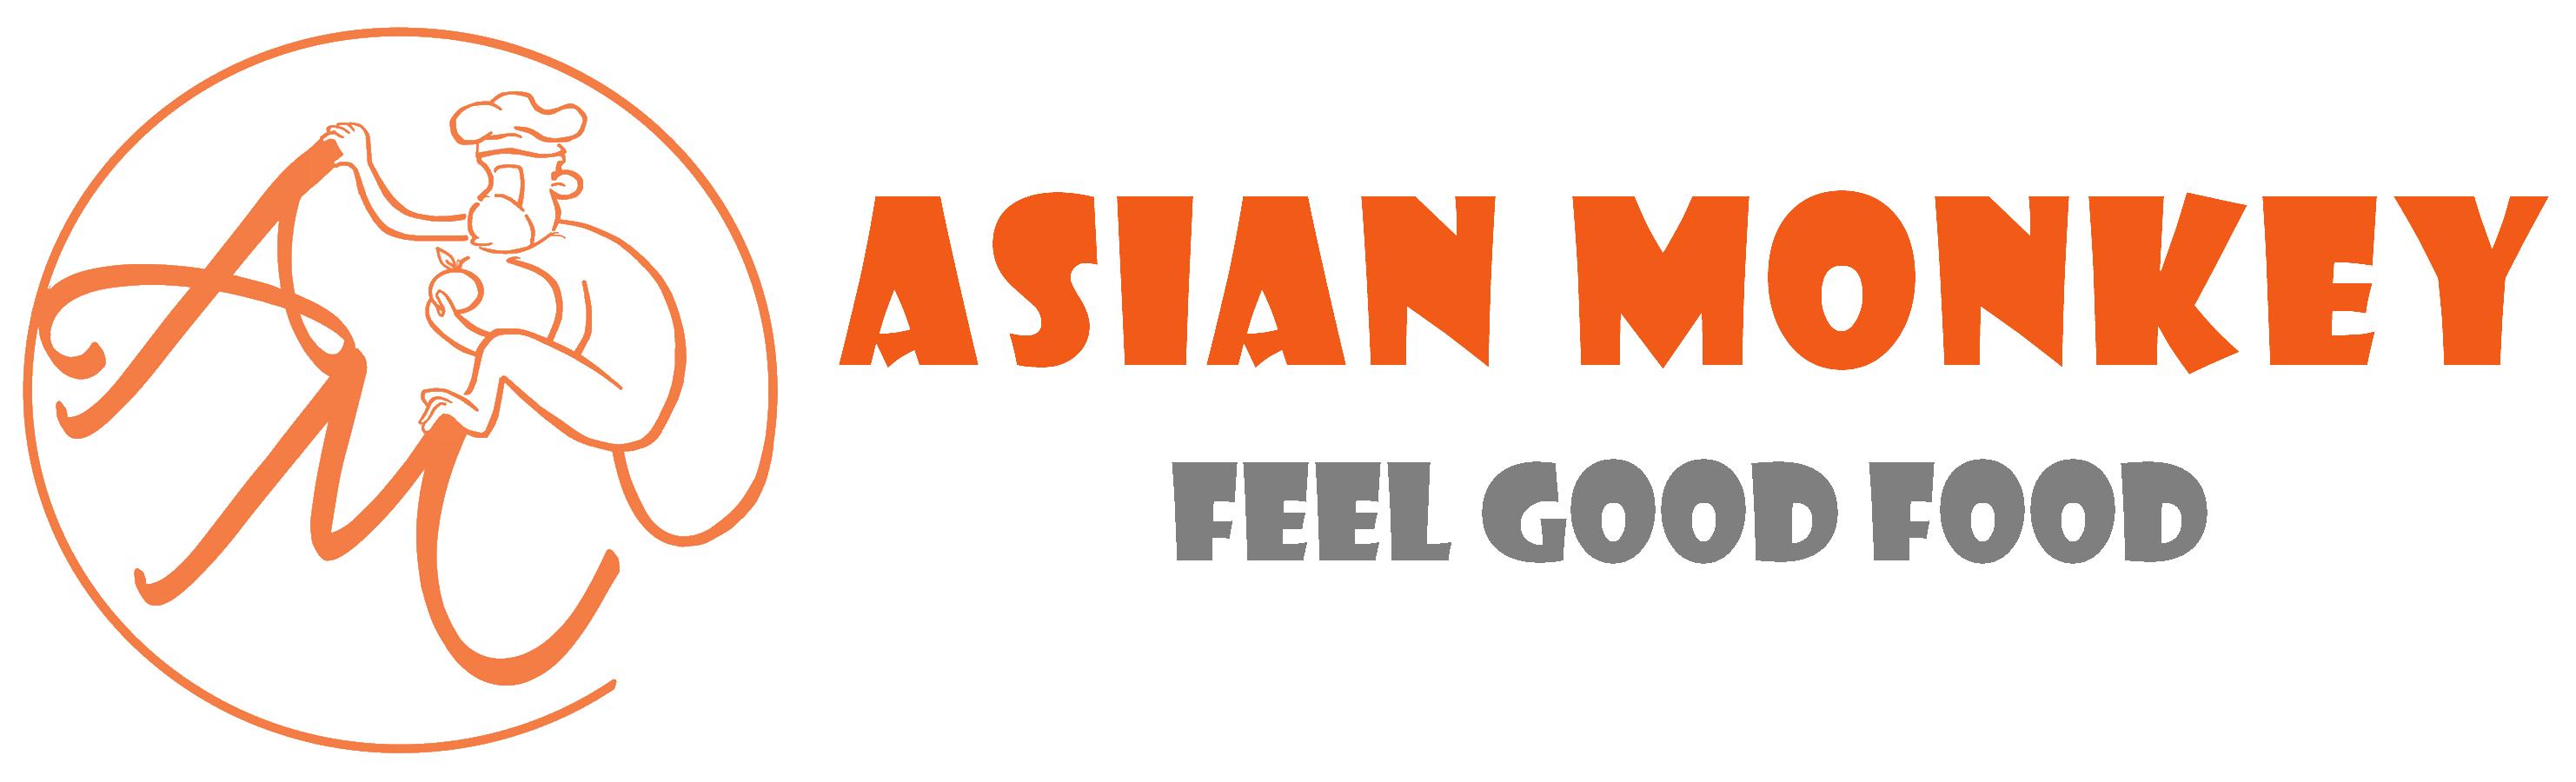 Asian Monkey